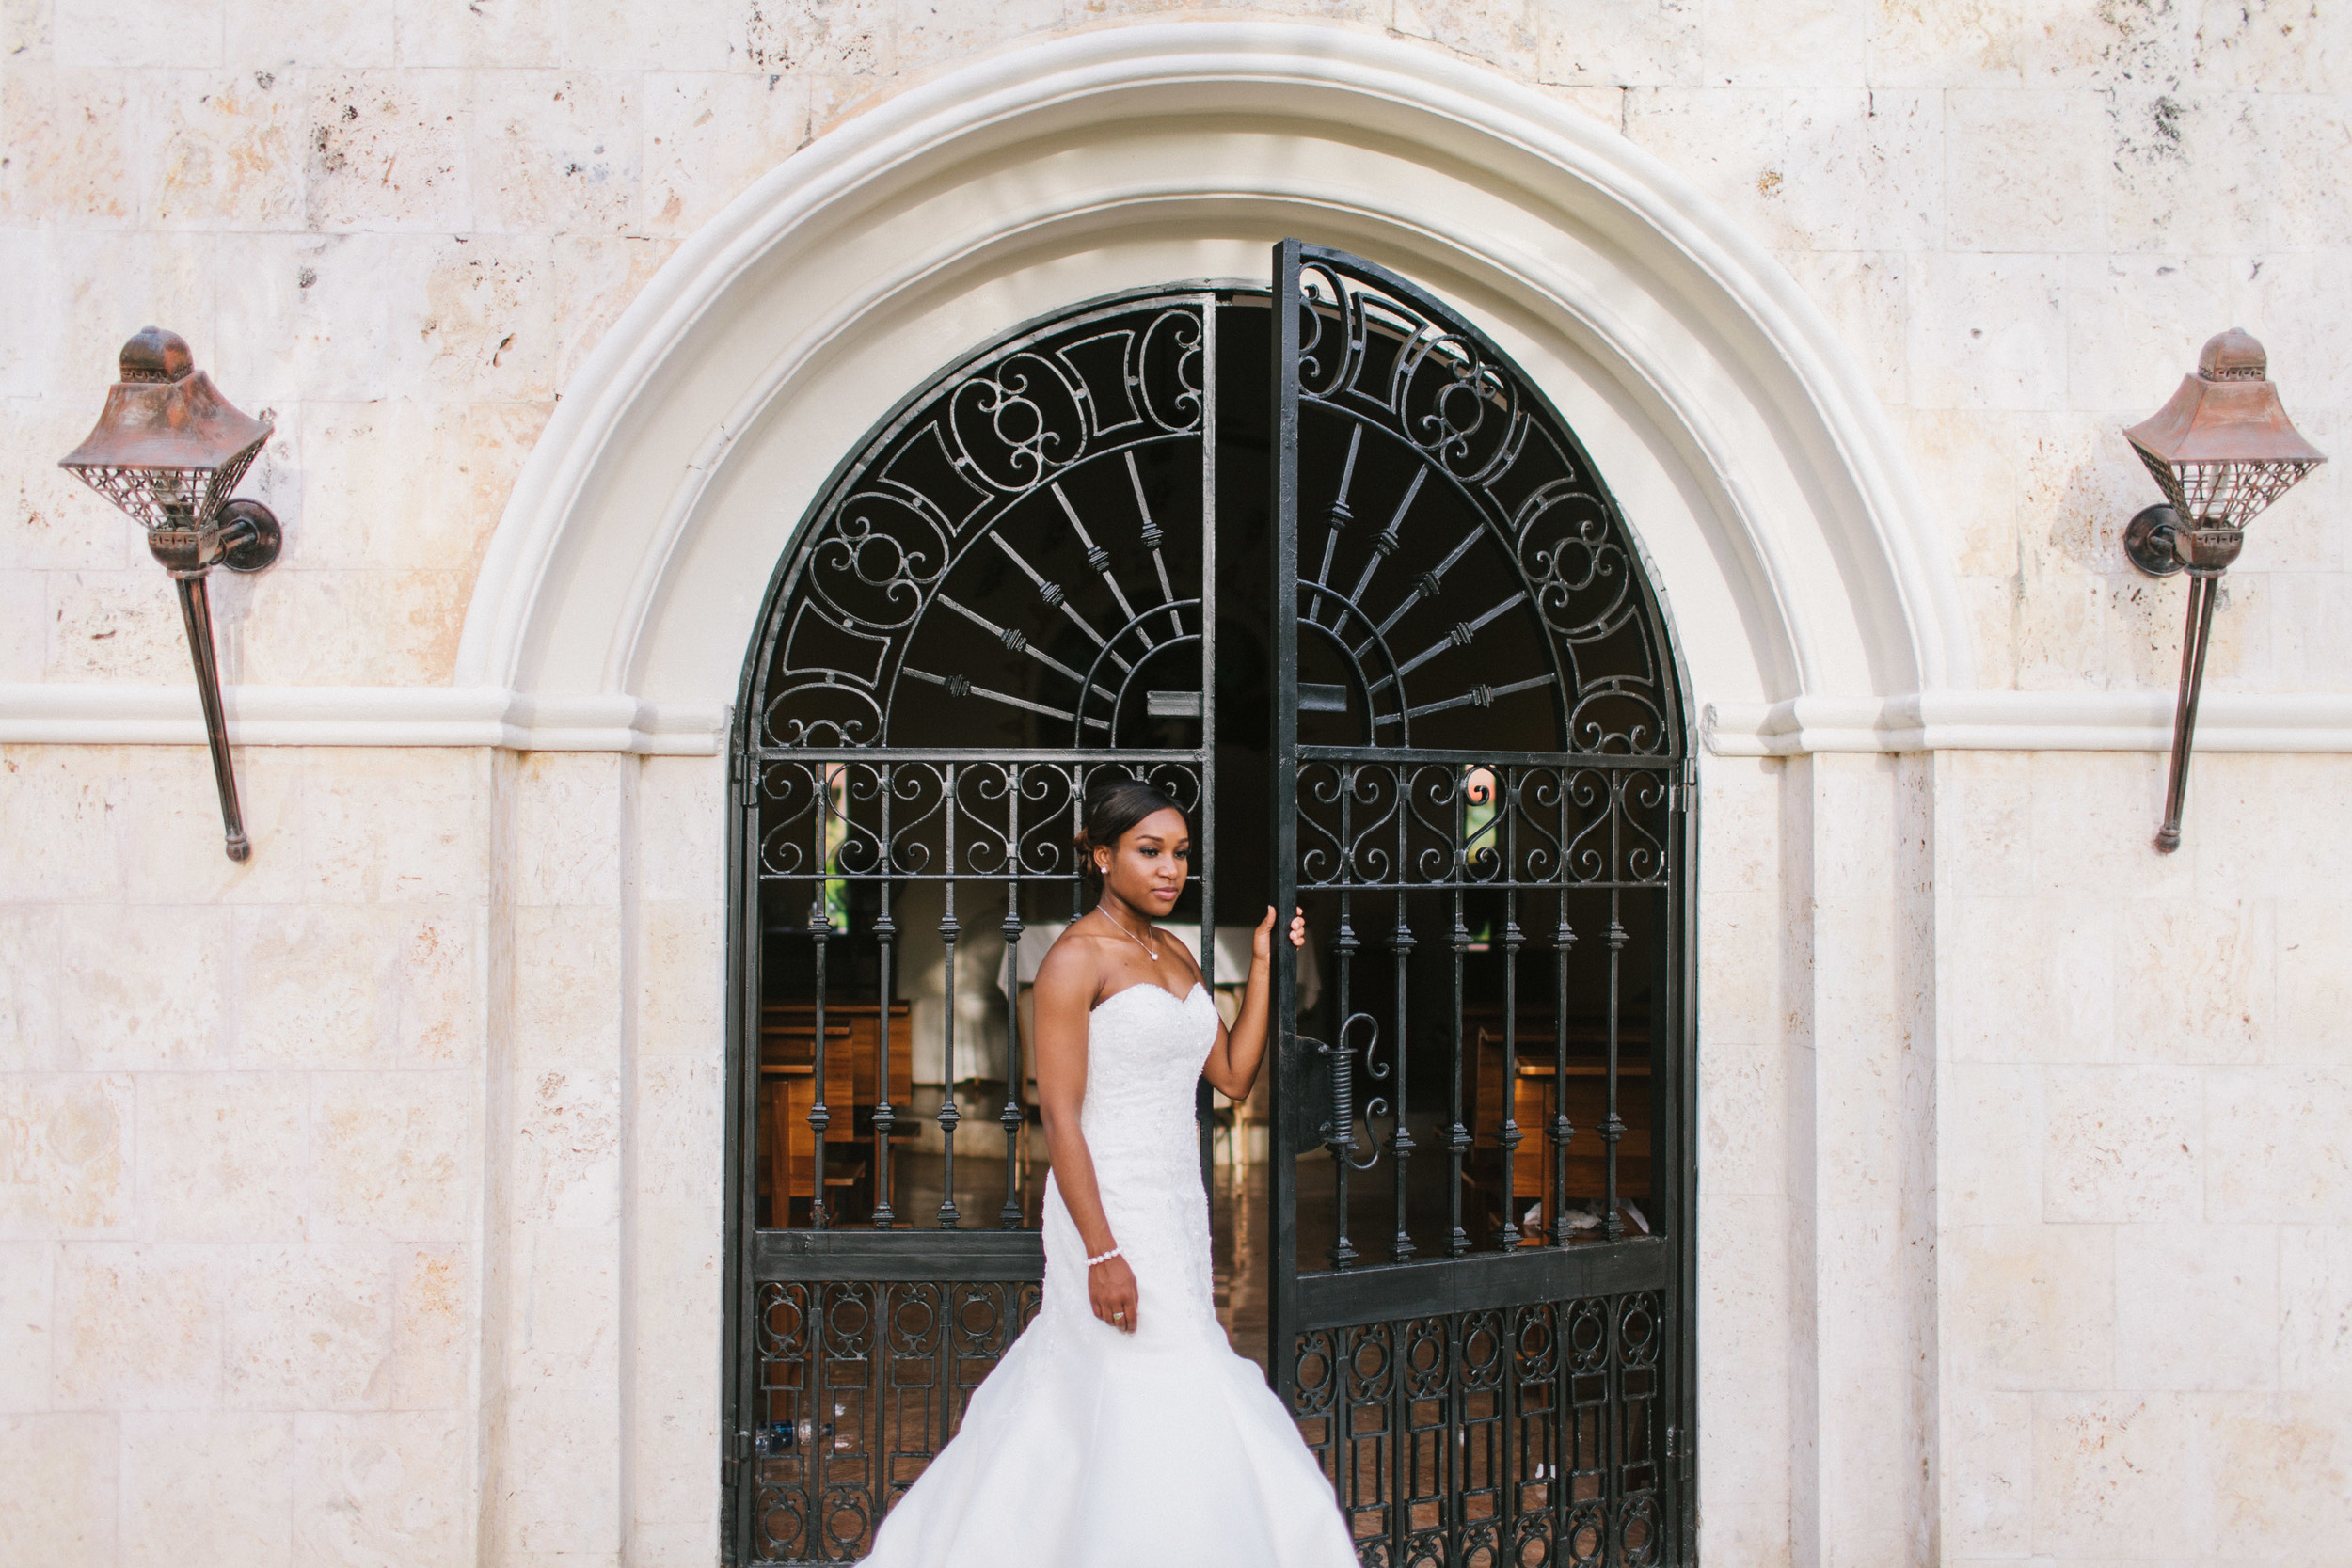 michael-rousseau-photography-dominican-republic-destination-wedding-cara-jason-colonial-majestic-dominican-republic107.jpg